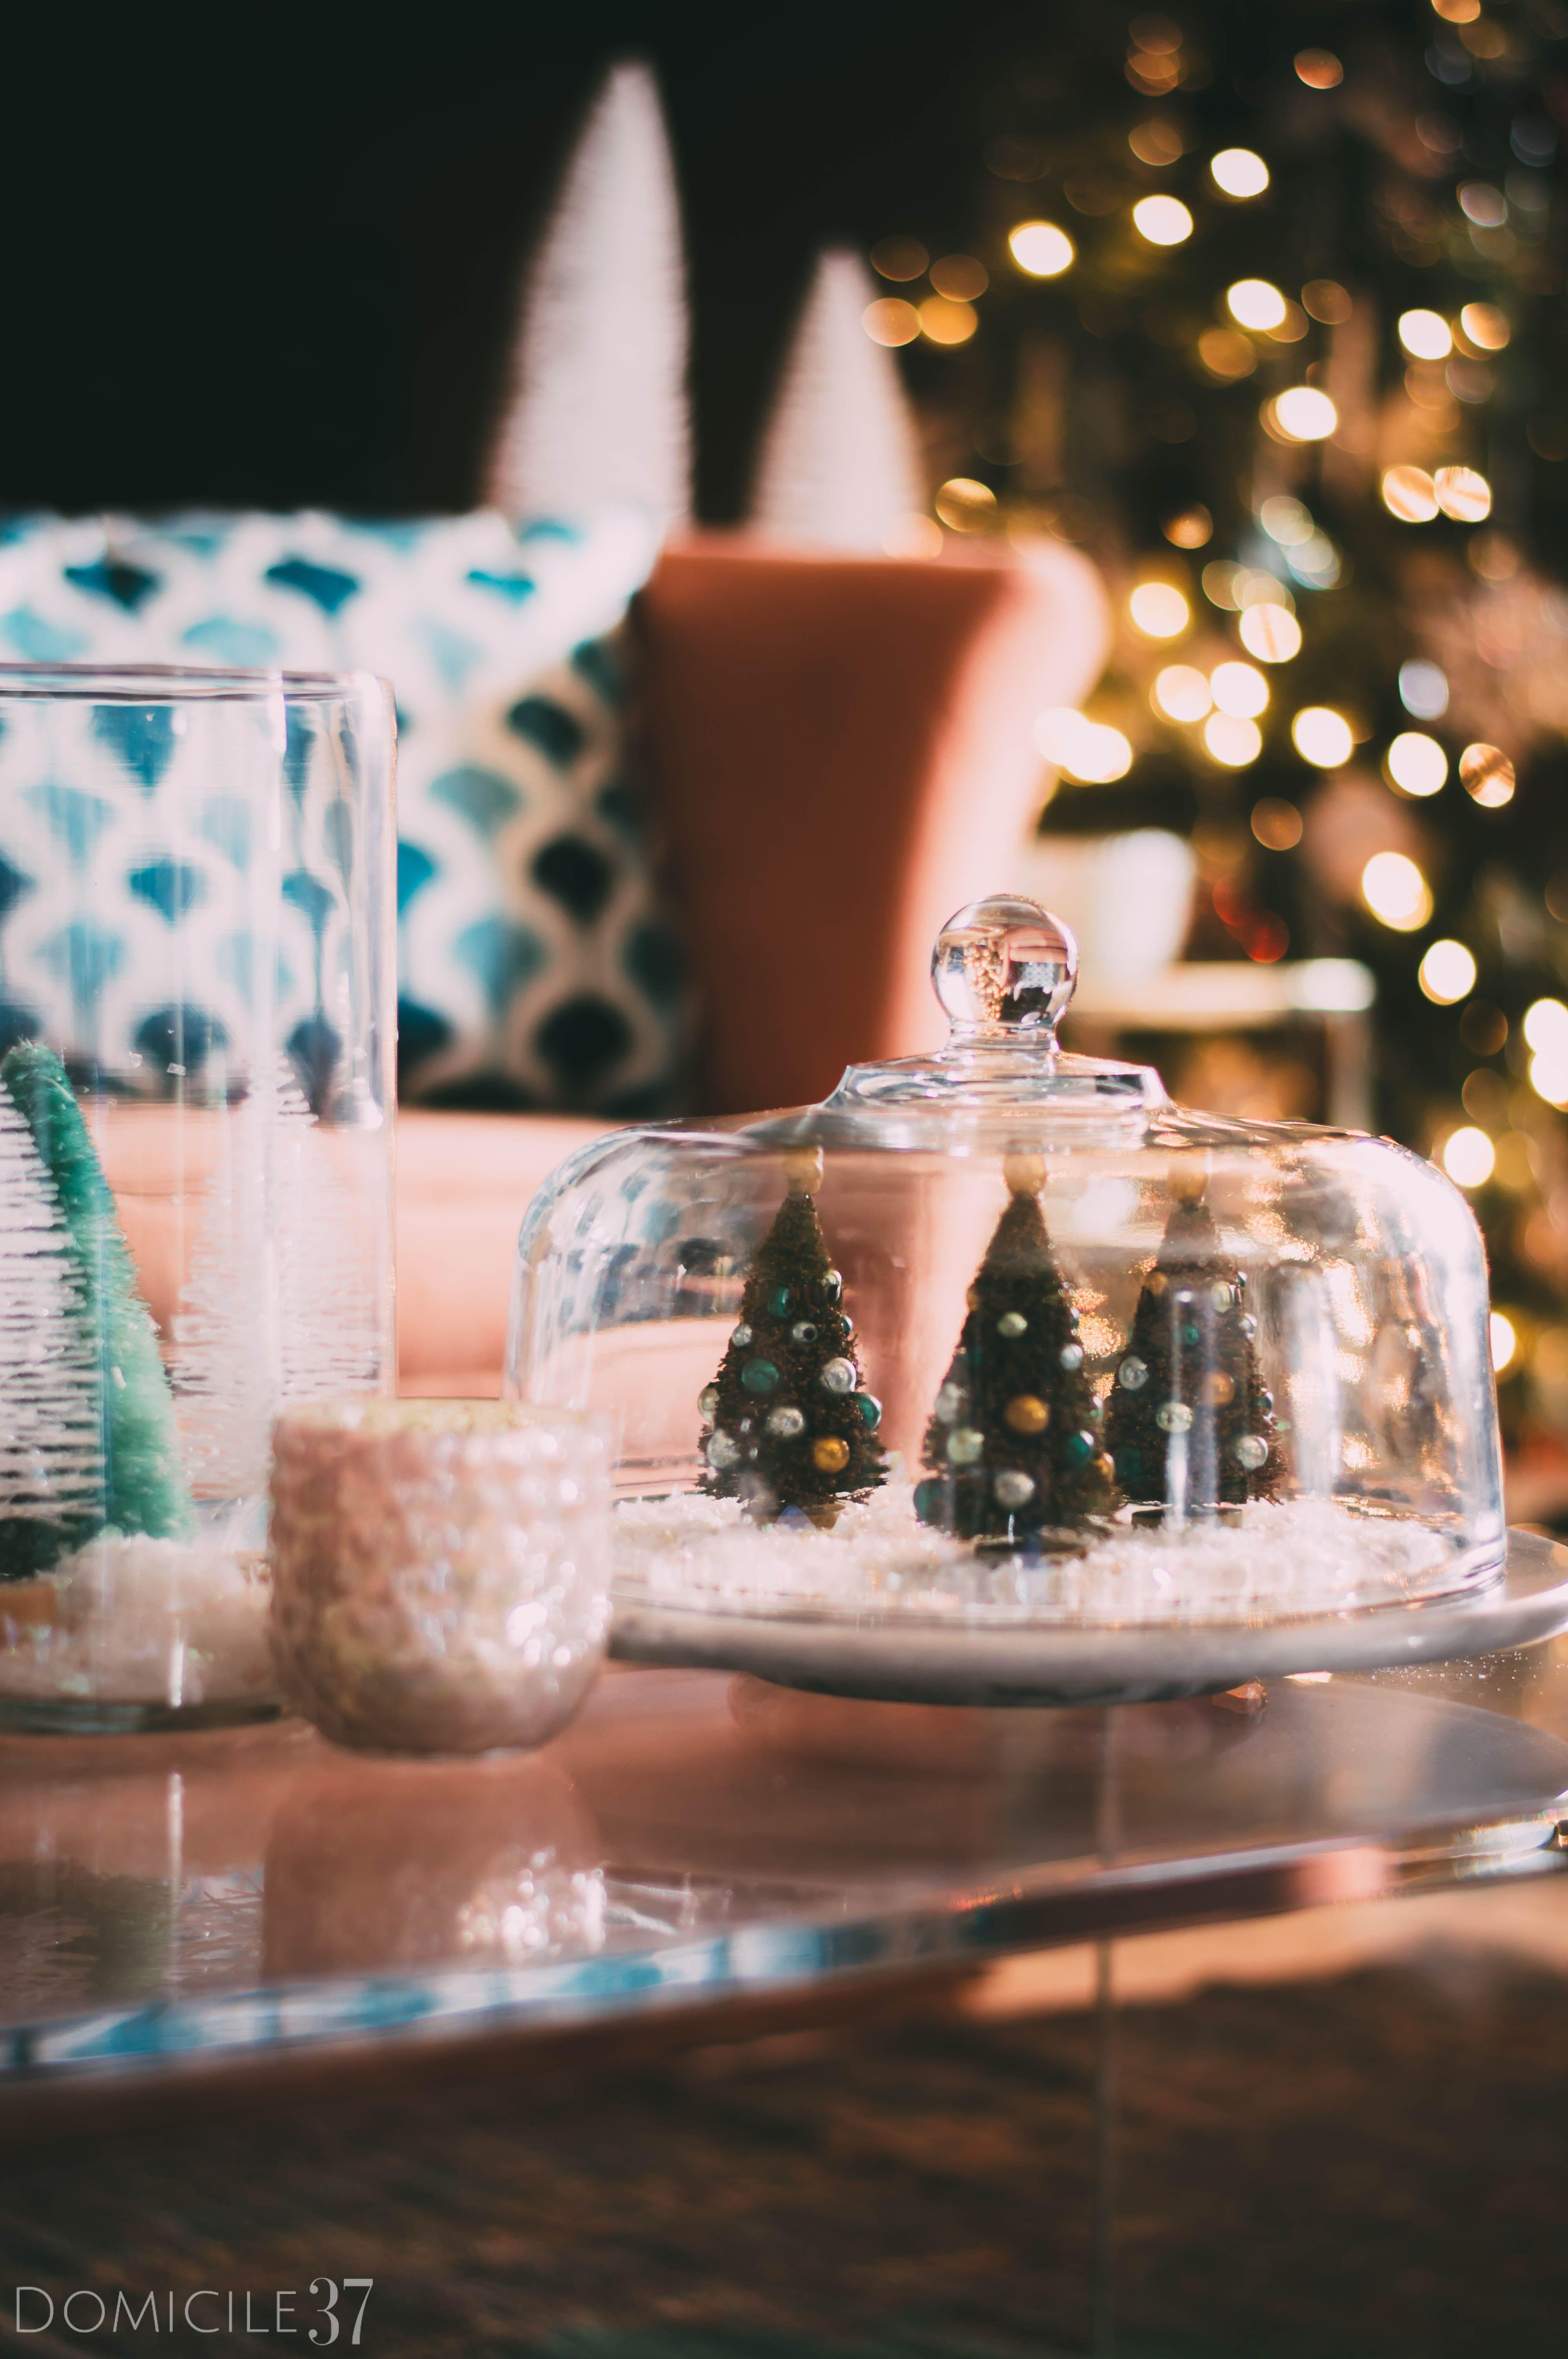 Vintage Eclectic Christmas Decor and DIY Terrarium